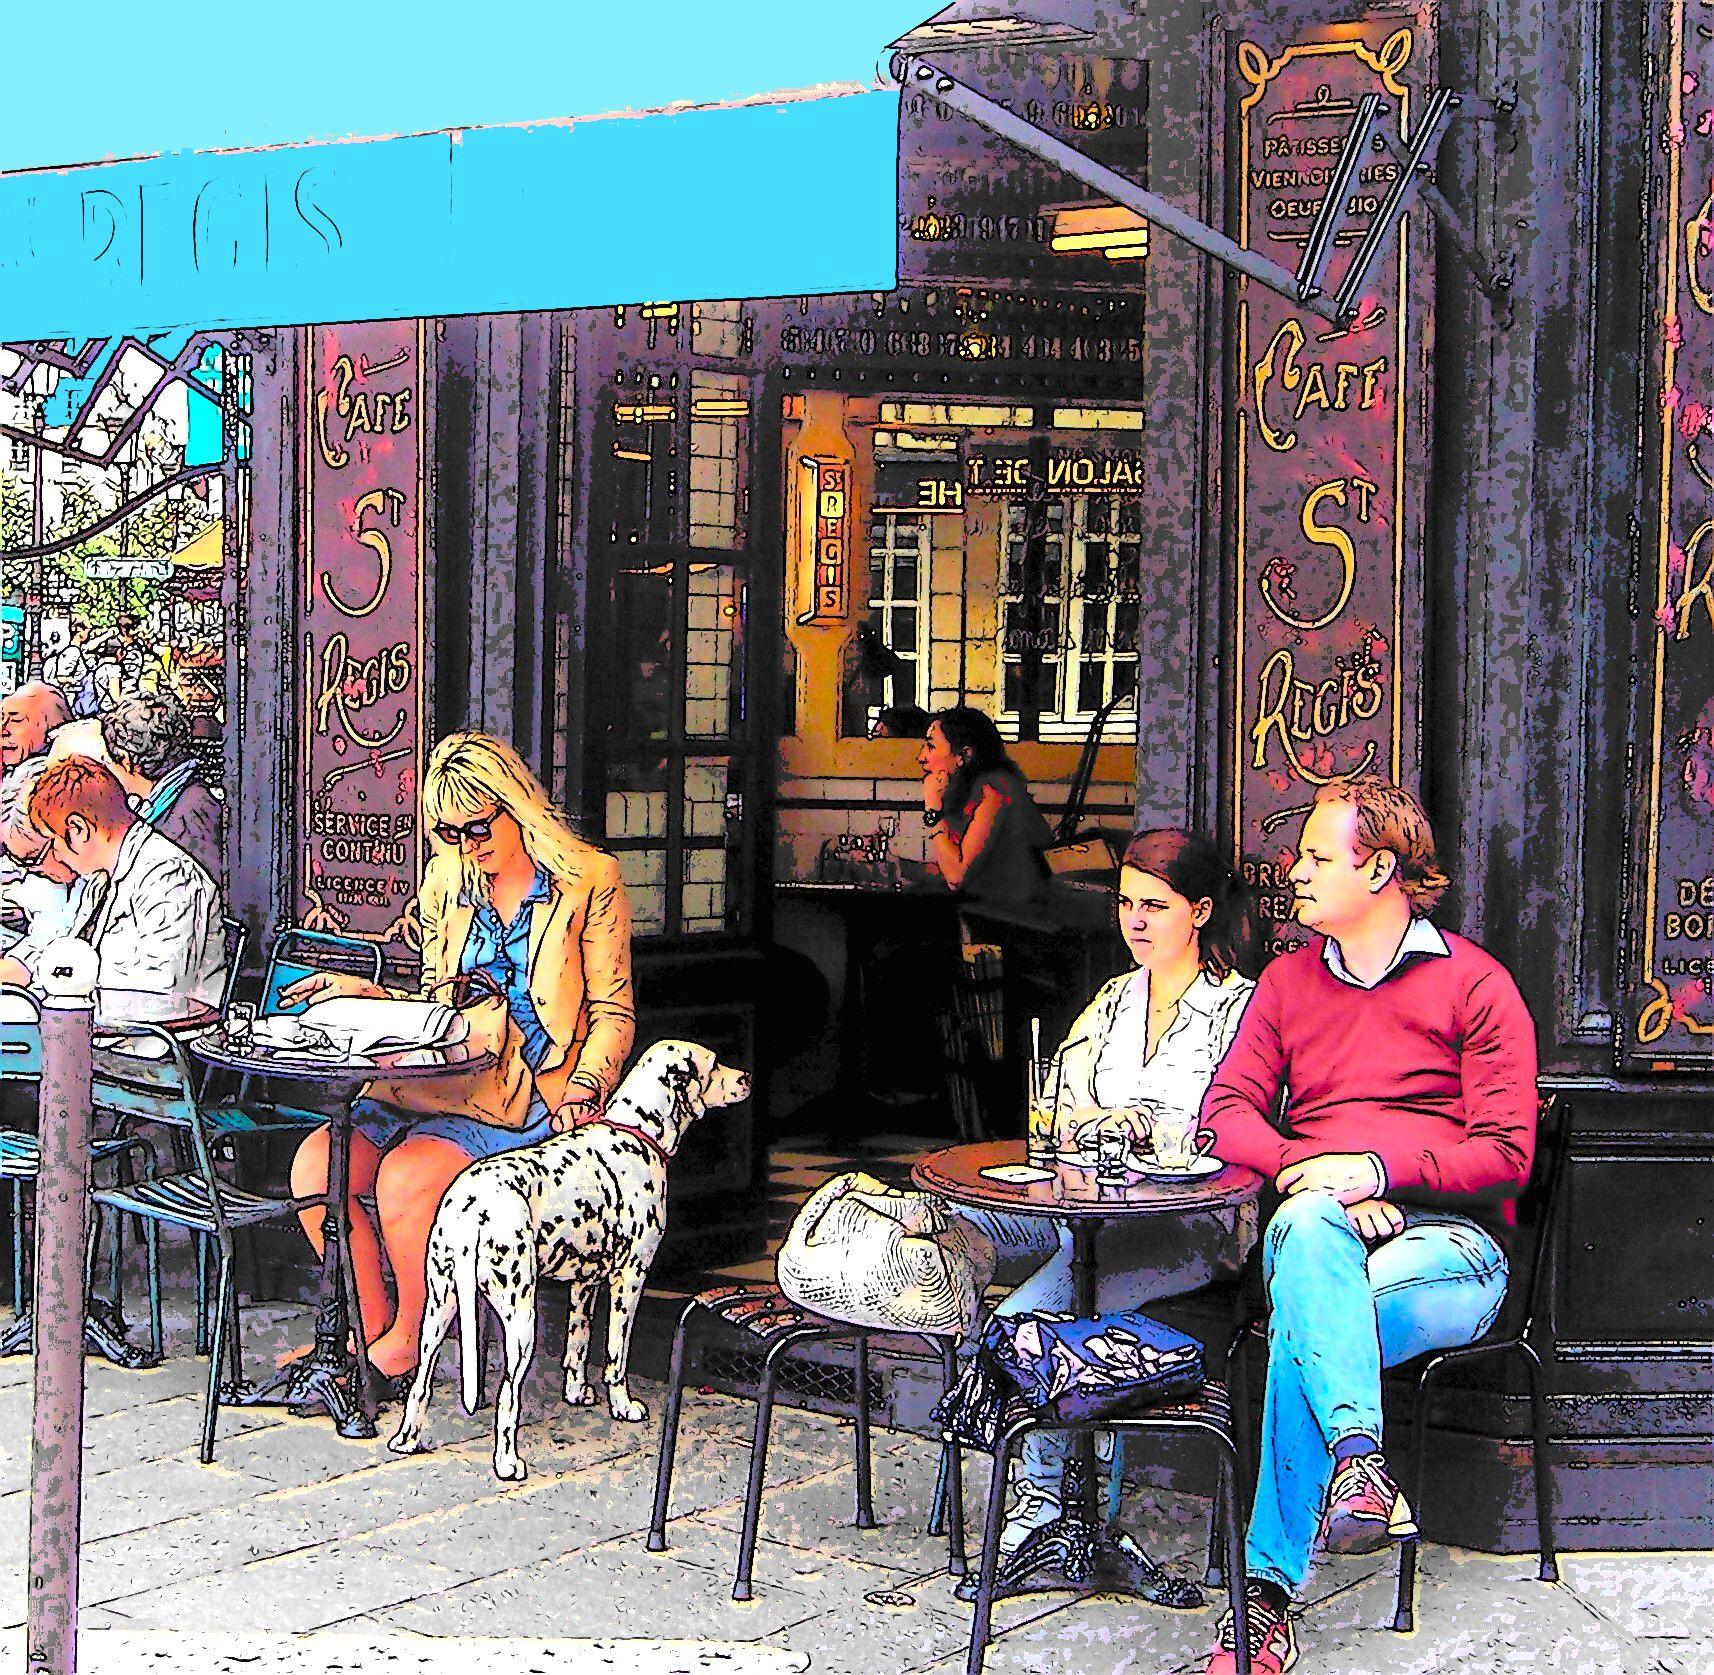 French Bistro Decor Dalmatian At The Paris Cafe Paris Cafe Digital Art Photography